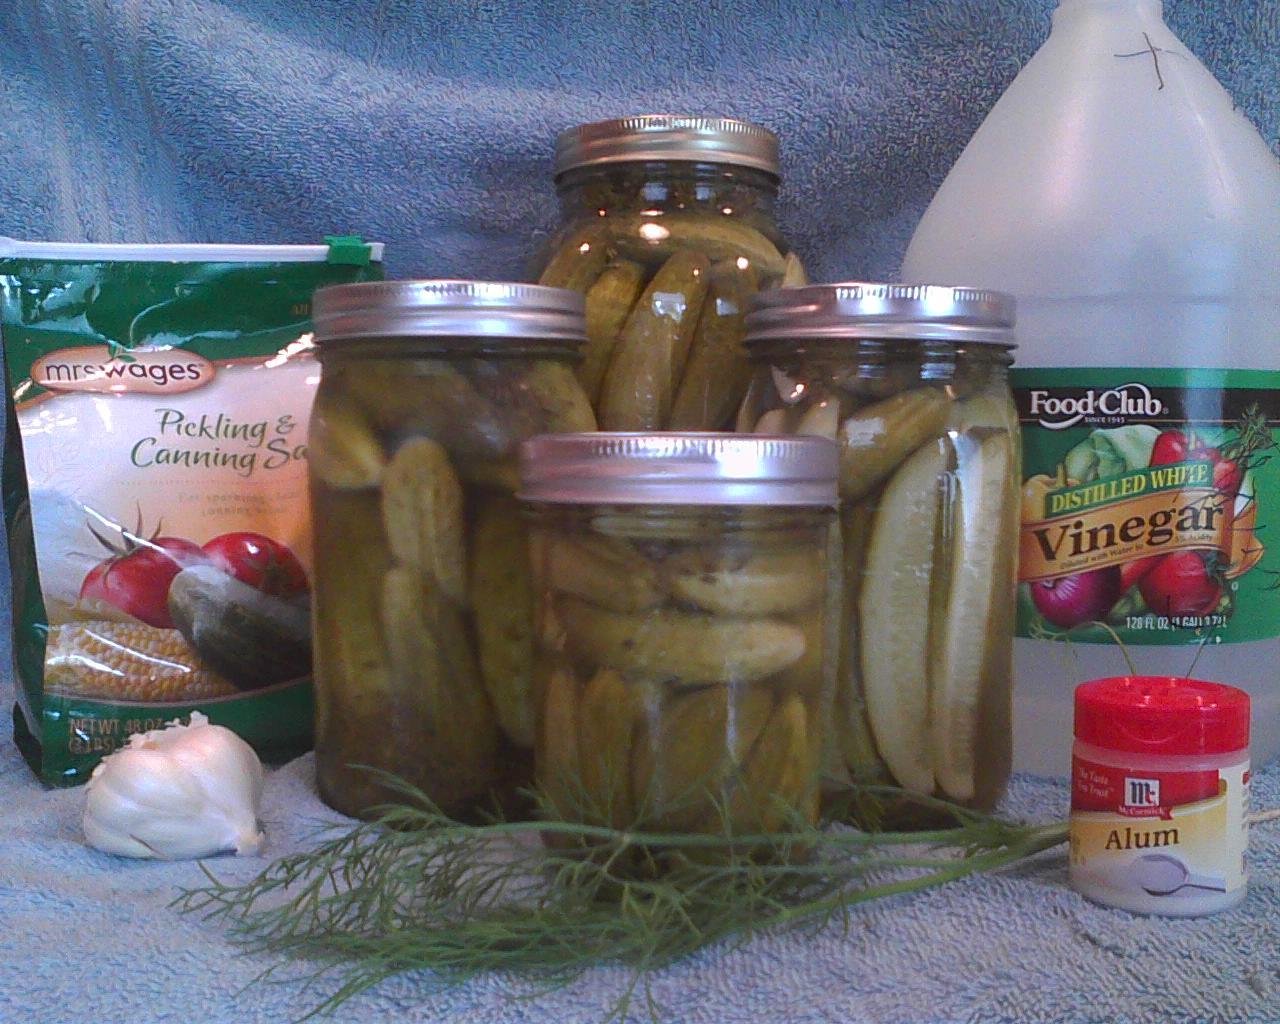 Grandma's Homemade Dill Pickles